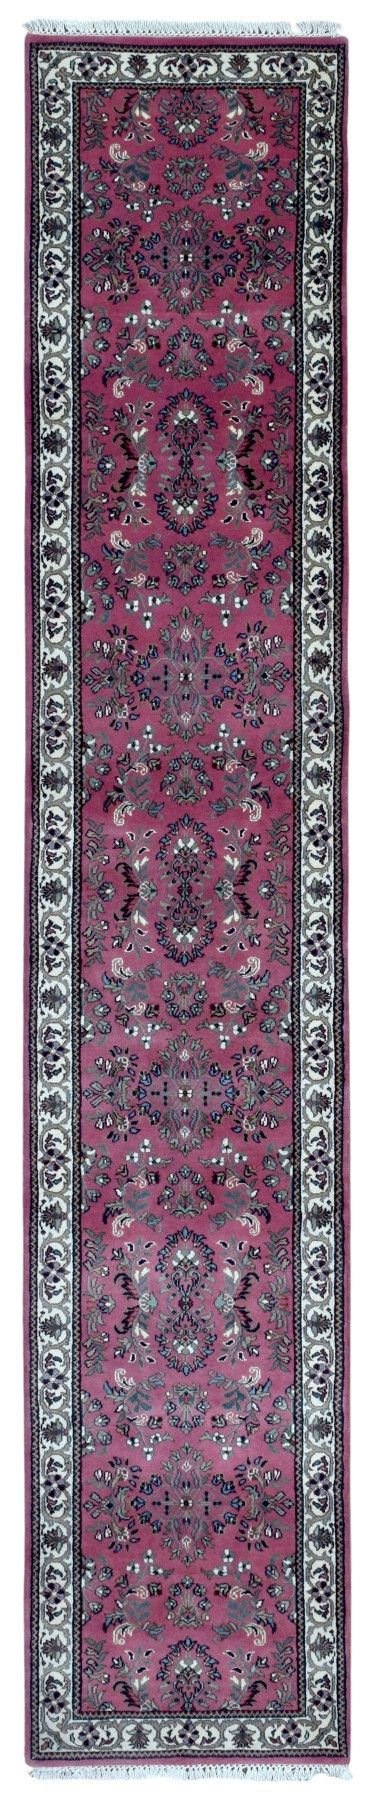 Fine Sarouk Oriental Long Runner Rug 2'X10'2